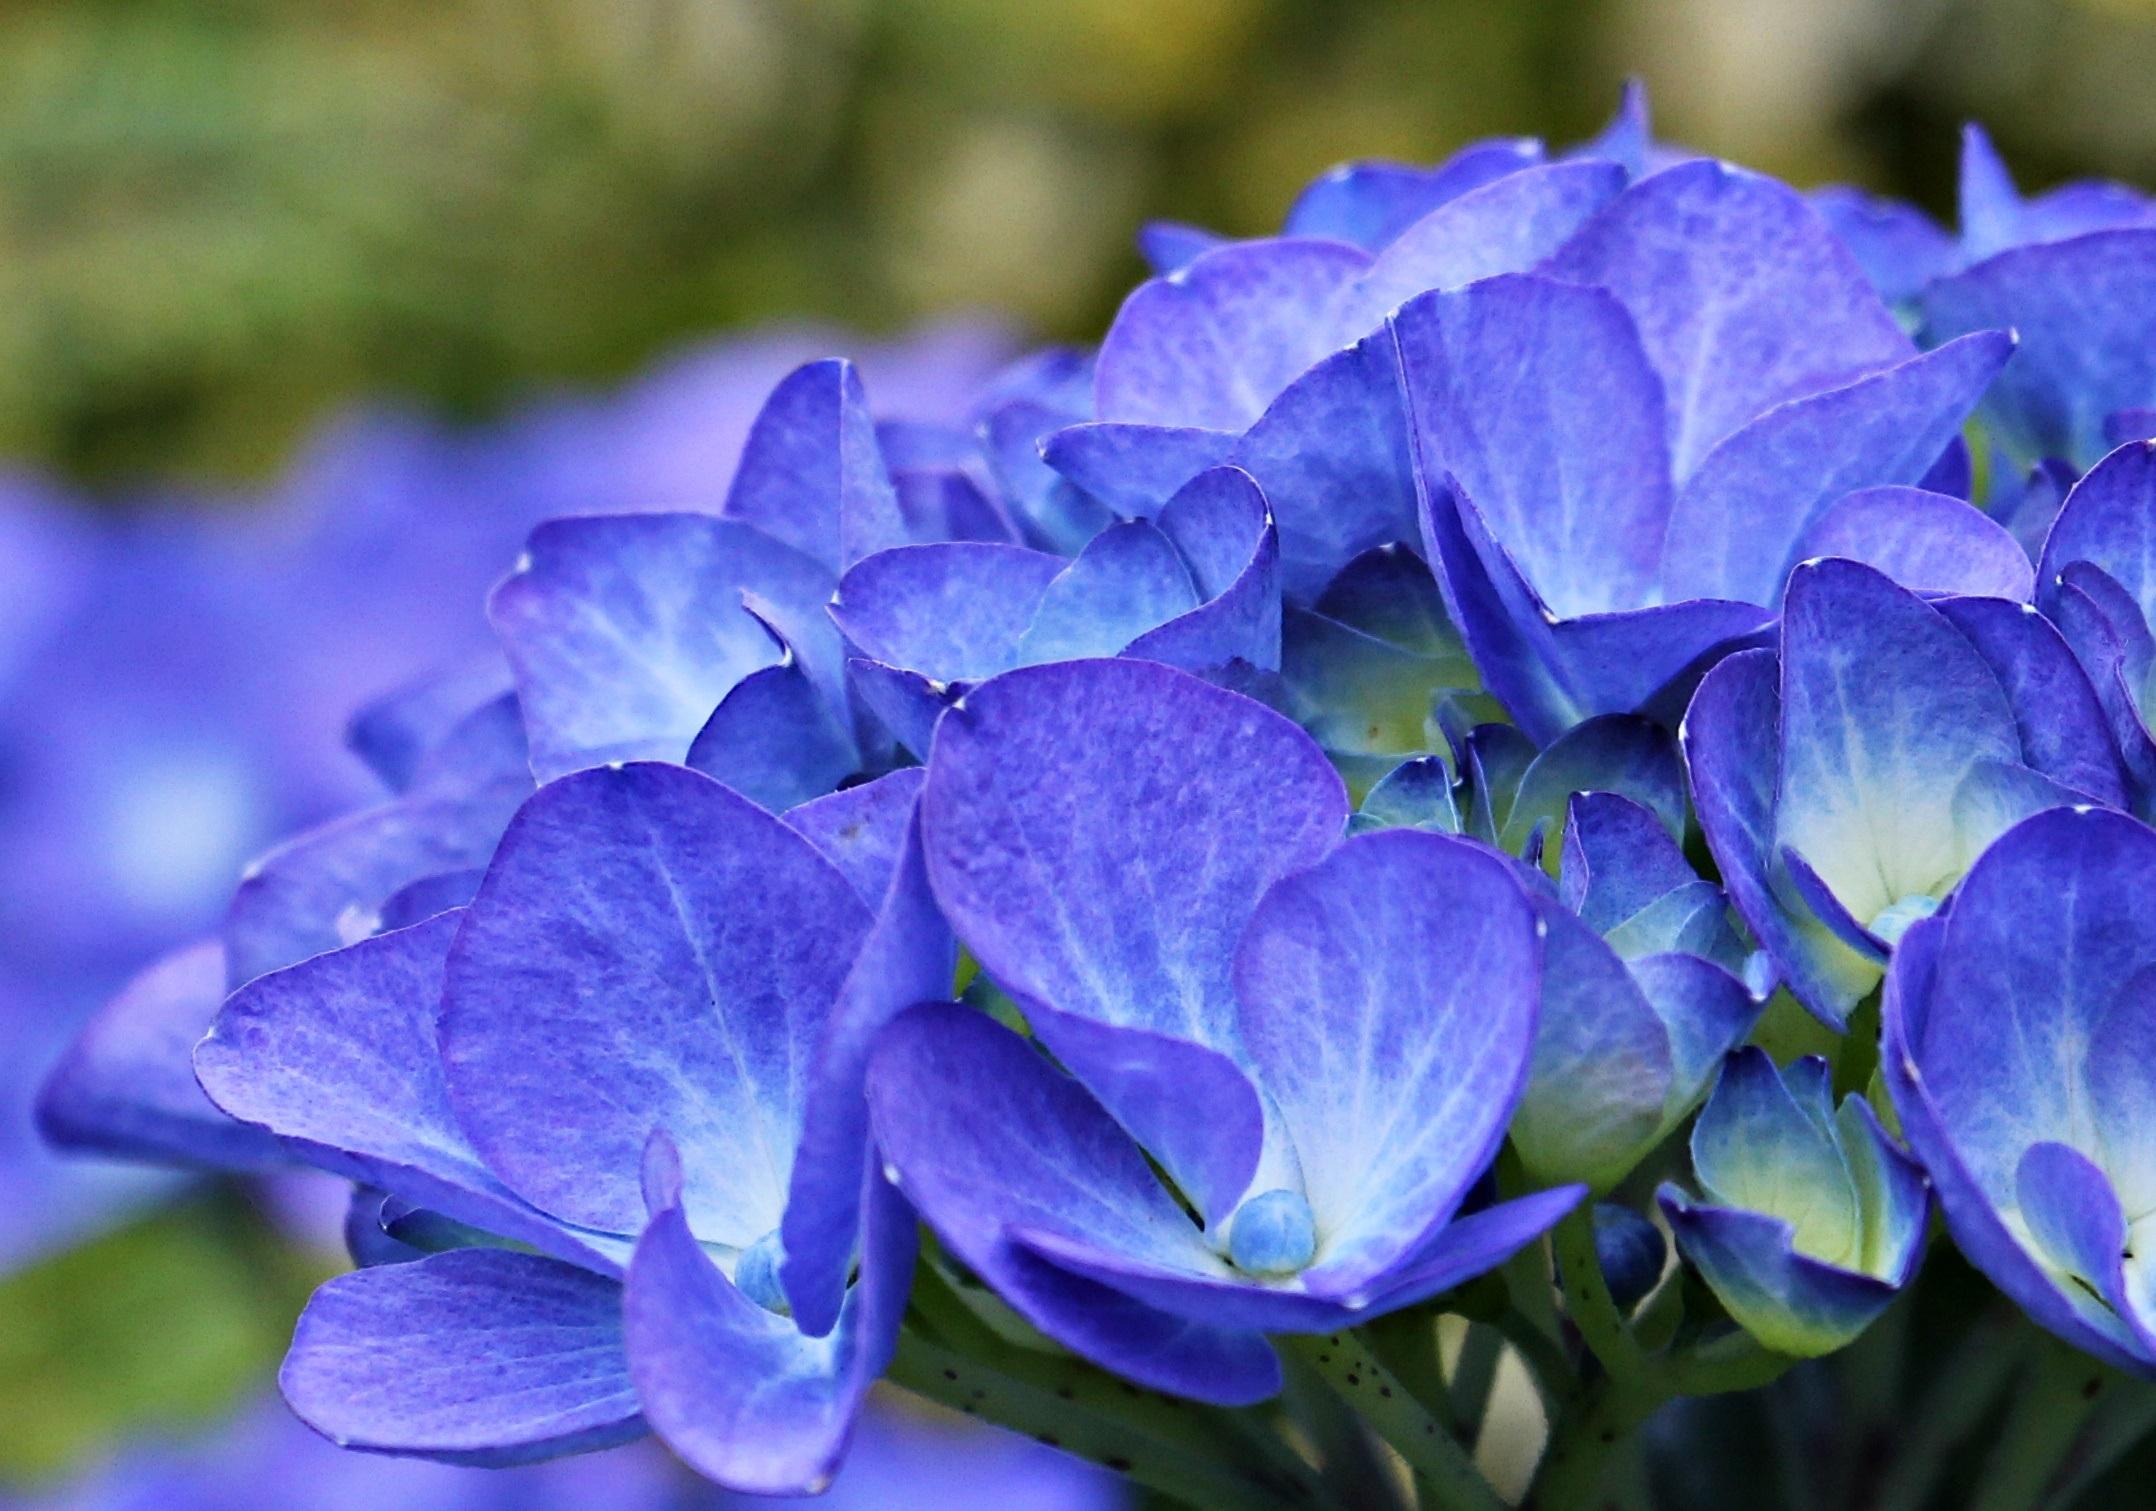 Free Images Nature Purple Petal Garden Flora Ornamental Shrub